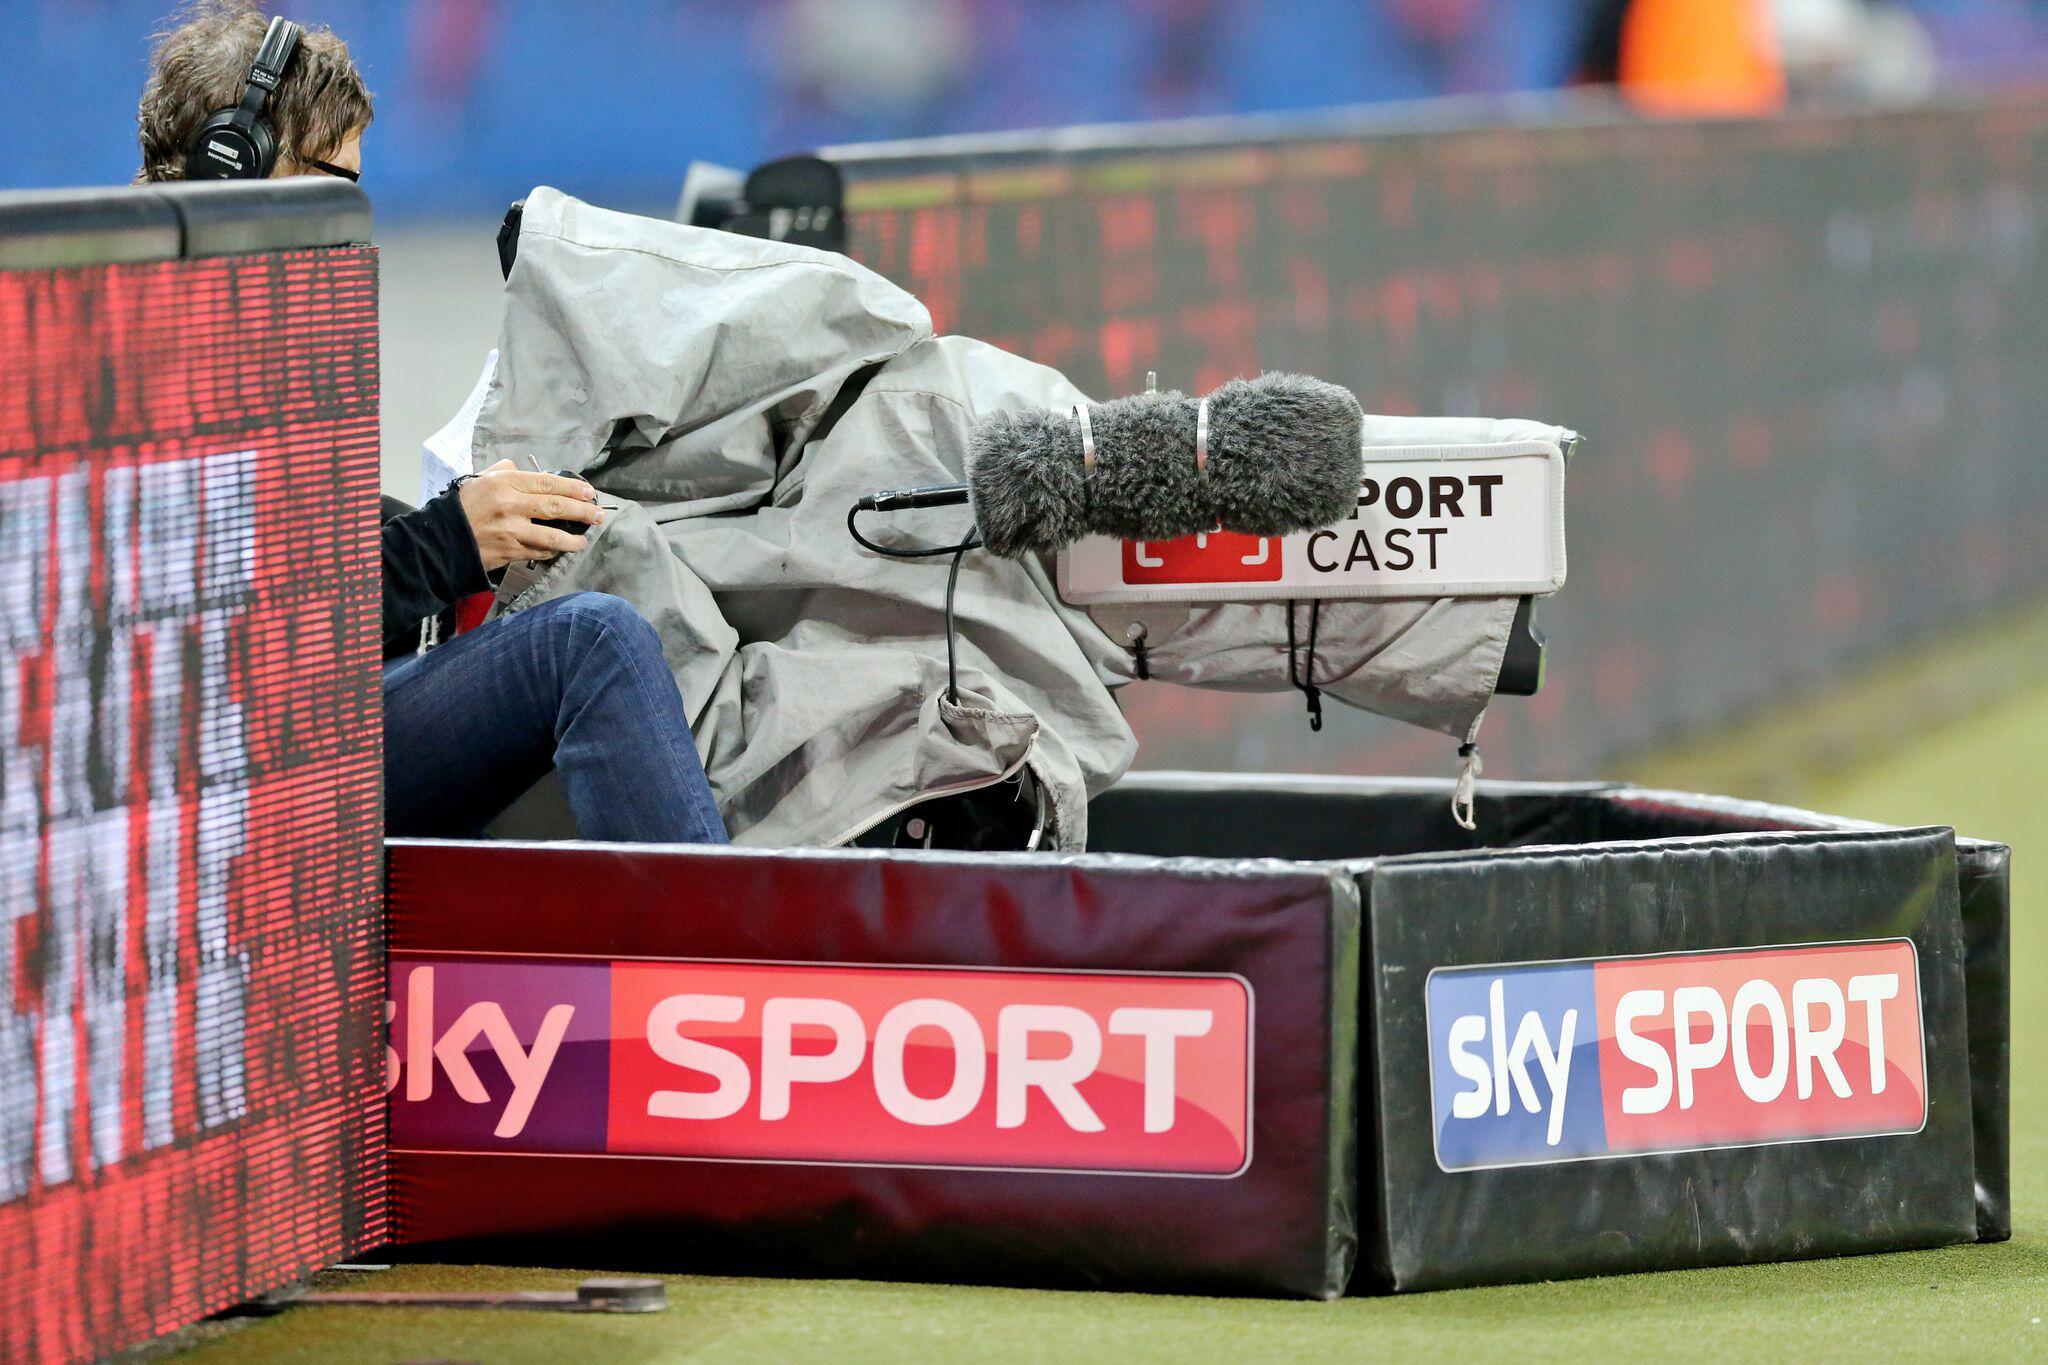 Bild zu Bundesliga-Übertragung, TV, Sky